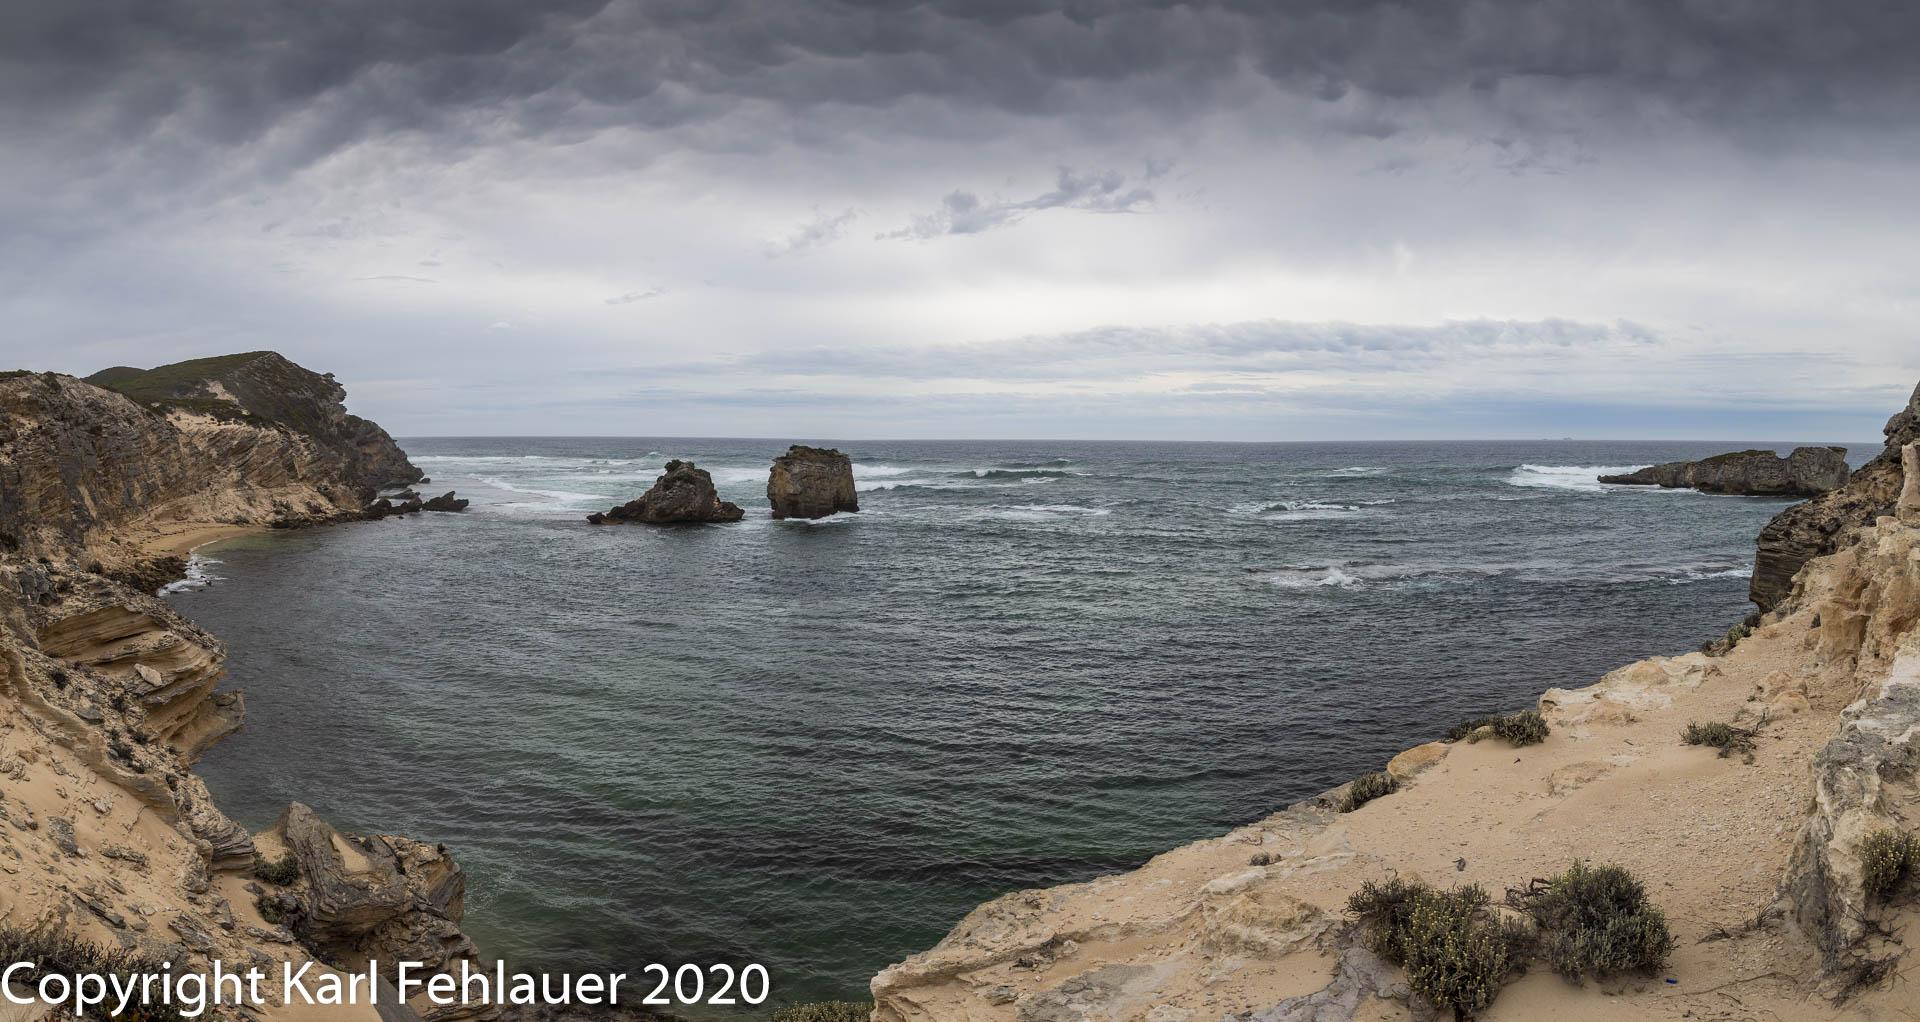 2020-02-12 Landscape - 016-Pano-Edit.jpg